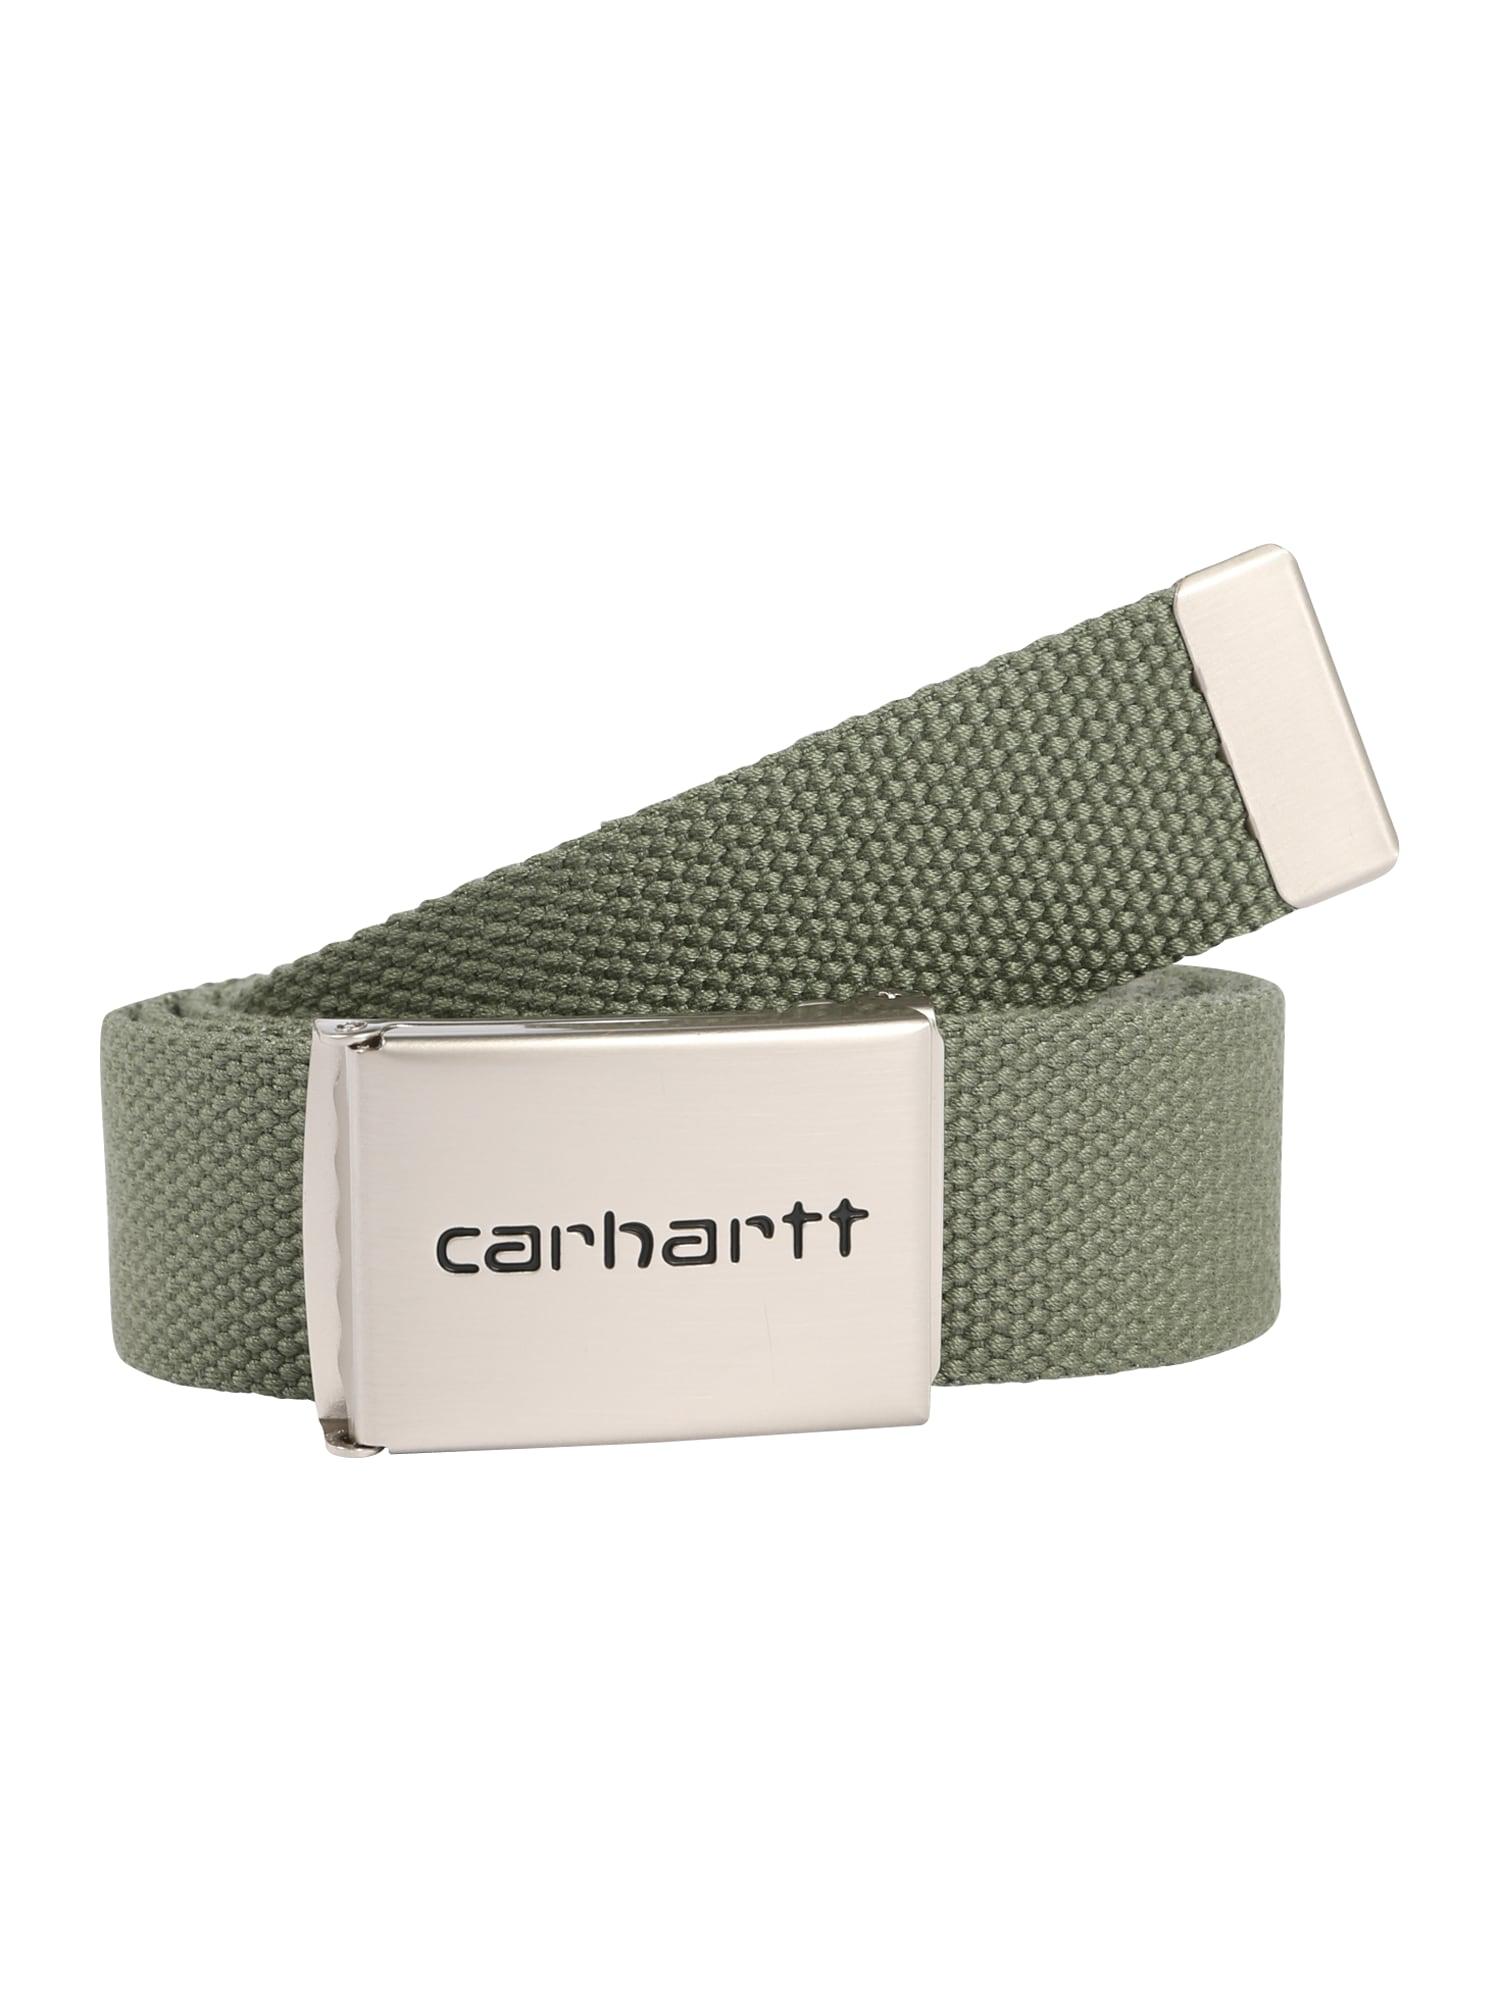 Carhartt WIP Diržas žalia